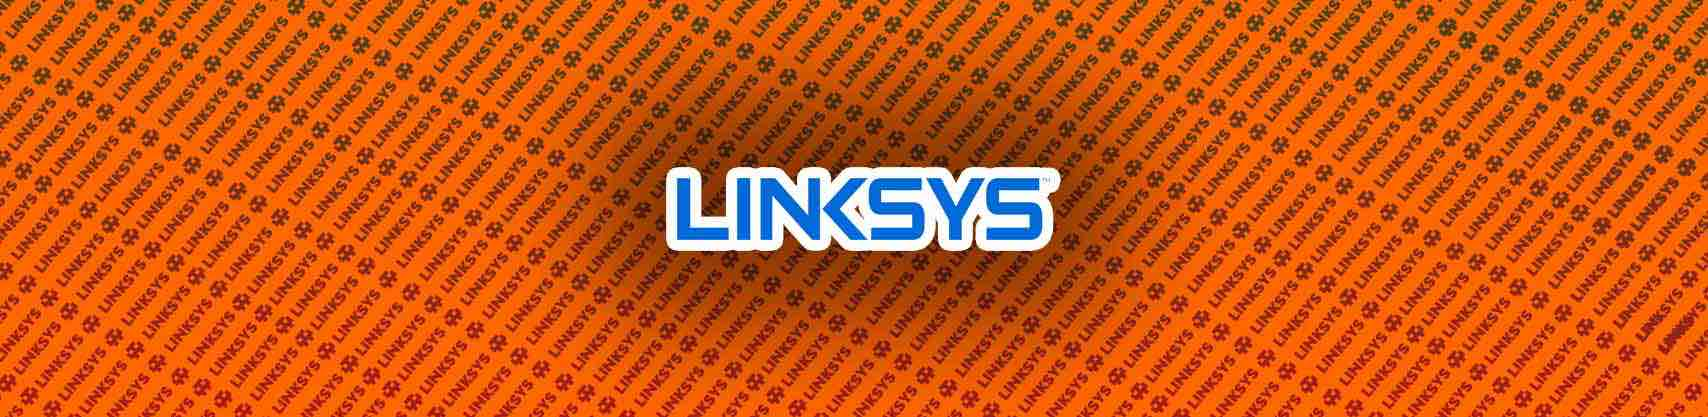 Linksys RE6500 Manual